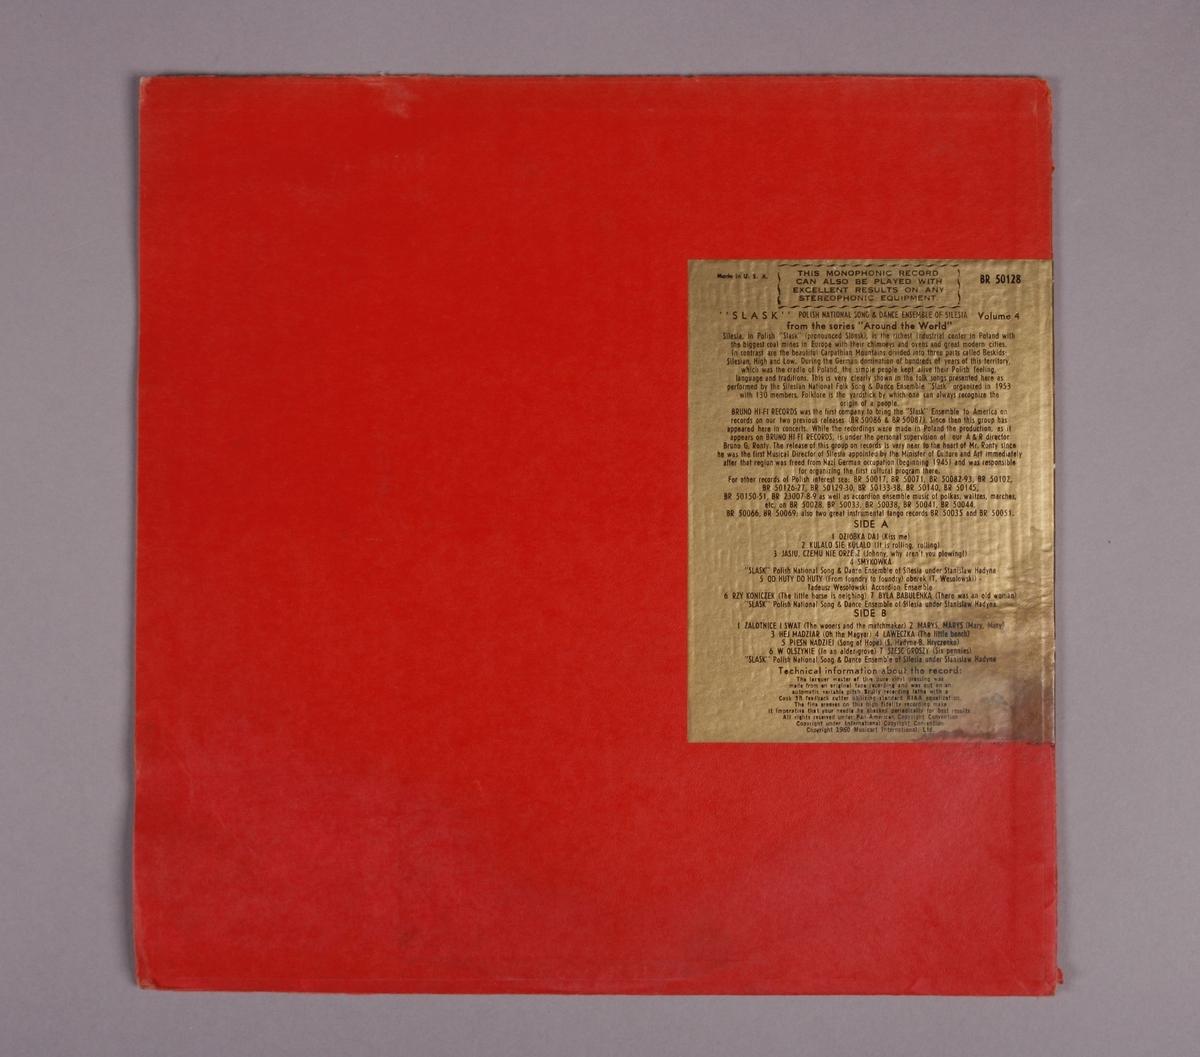 "Grammofonplate i svart vinyl og plateomslag i tykk papp. Plata ligger i en uoriginal papirlomme stemplet ""Angel Records""."